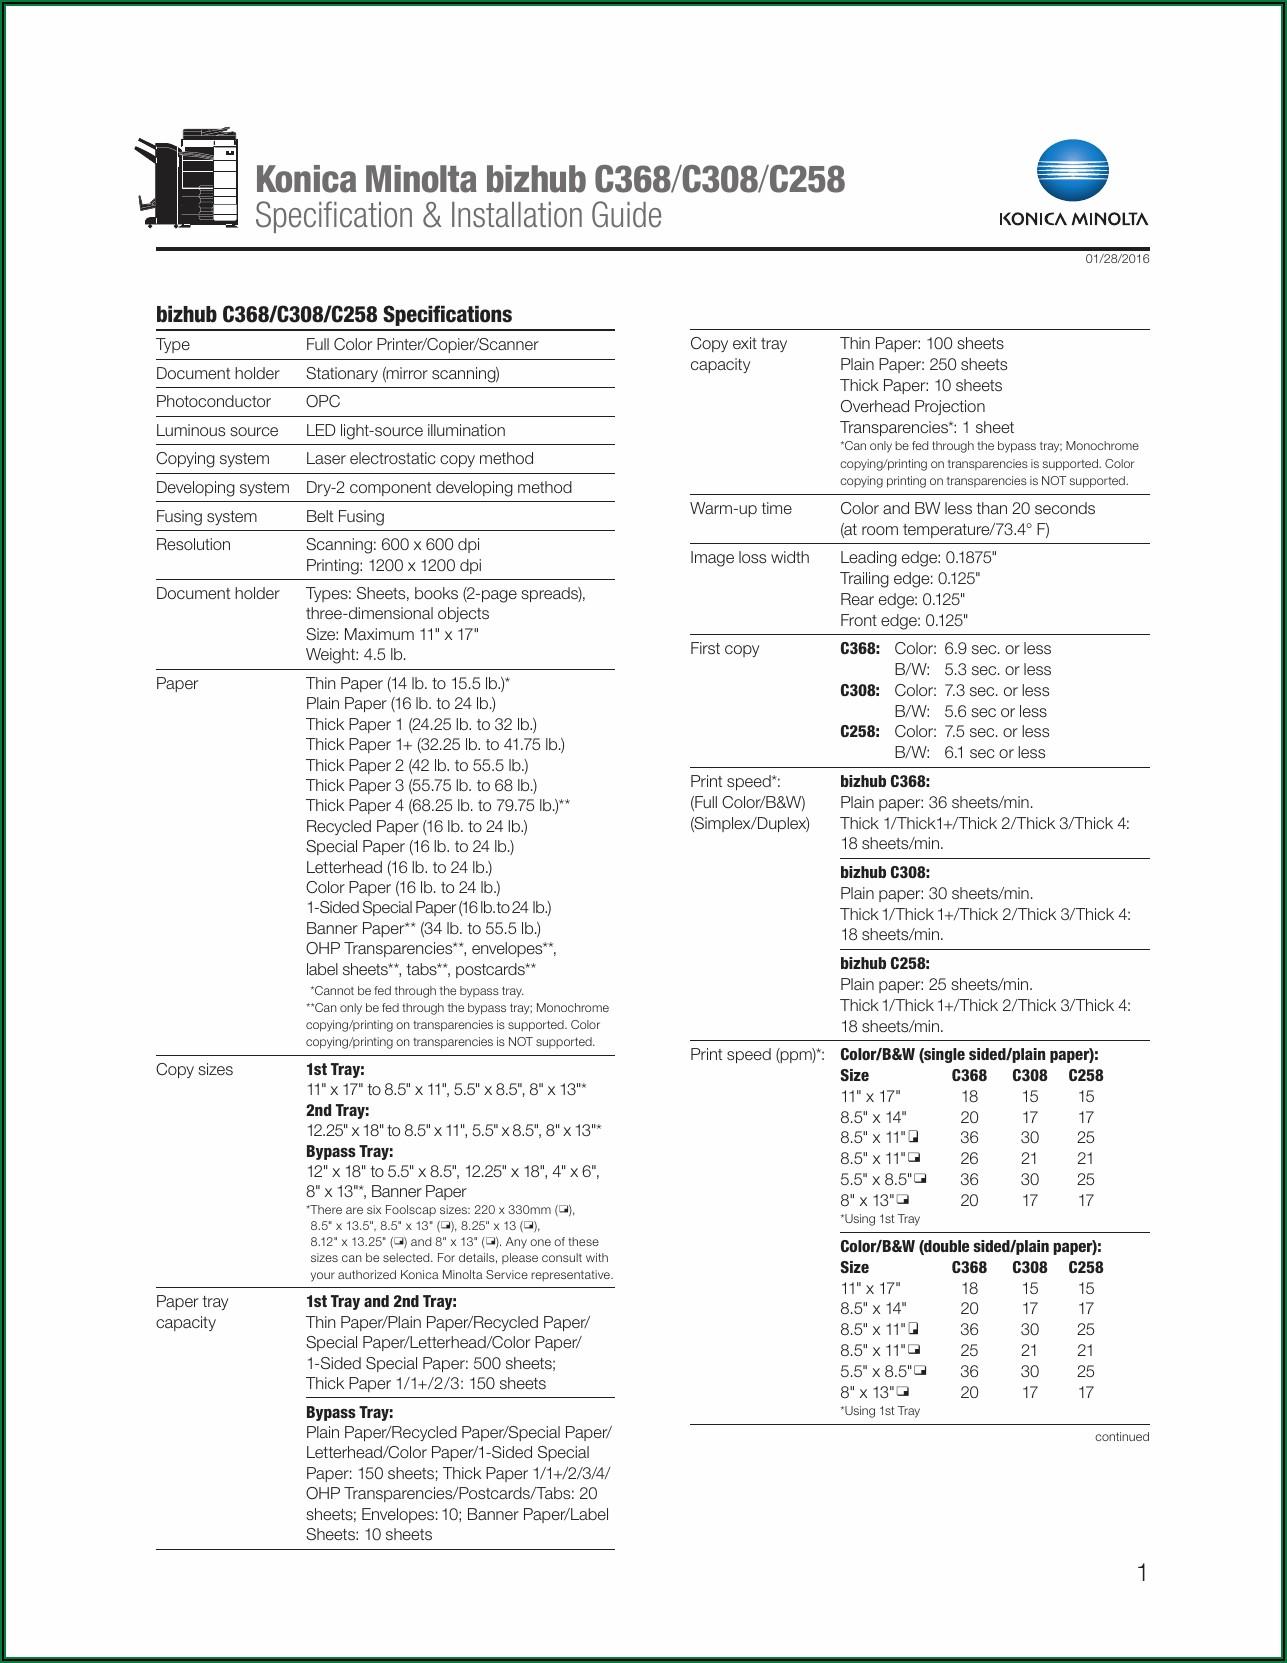 Konica Minolta Bizhub C258 Specifications